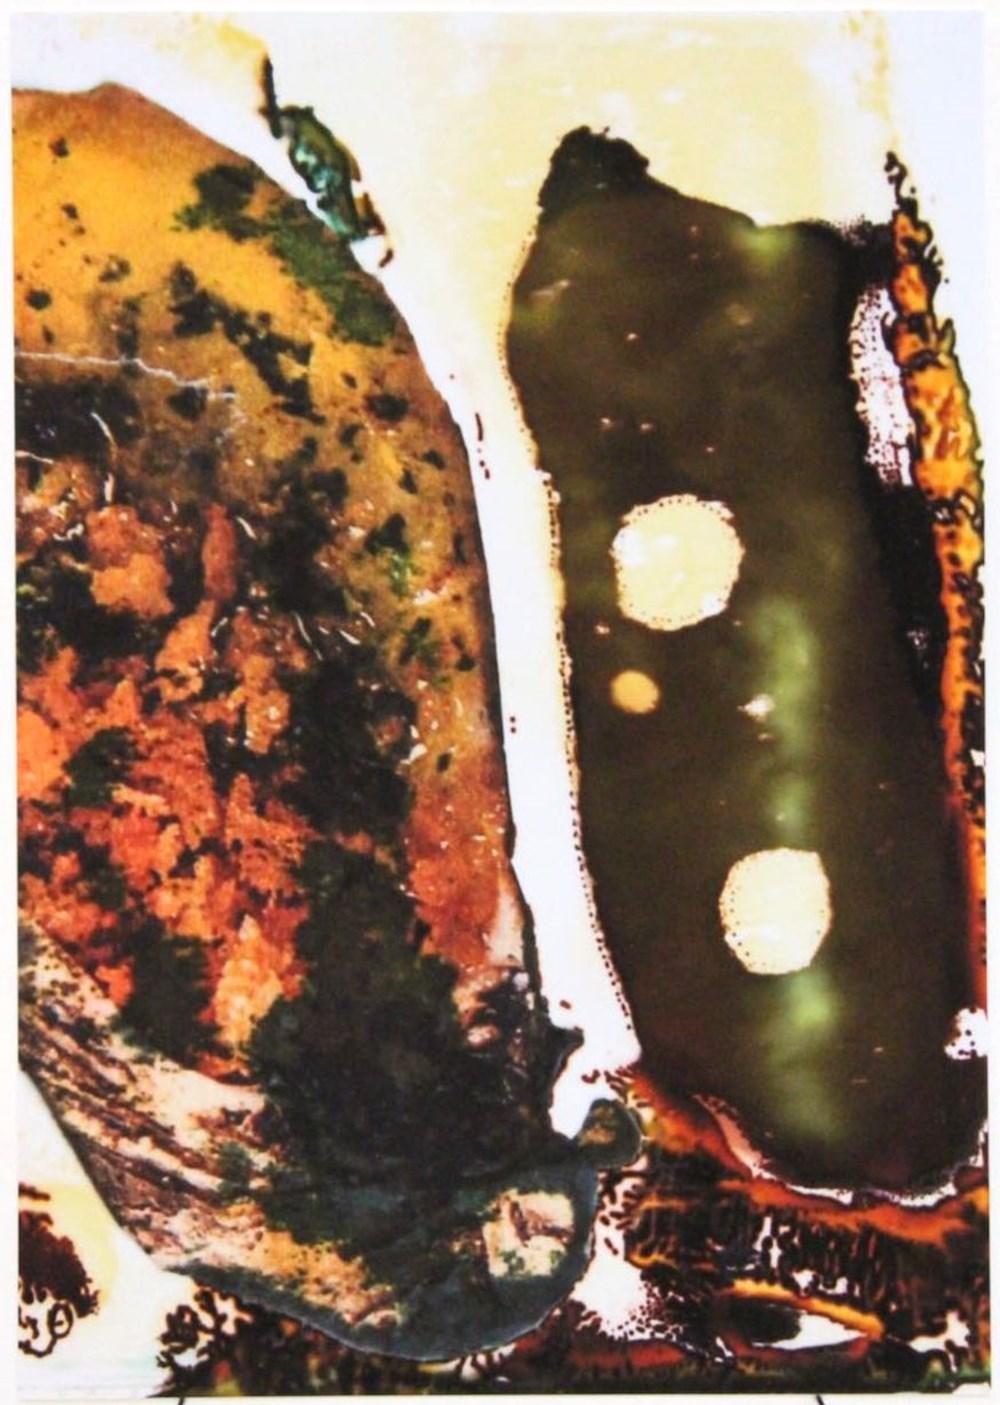 Life on Venus III | The Organic, Timed Auction - Lot 28, Sandy Sigala, My Fluid Little Babies